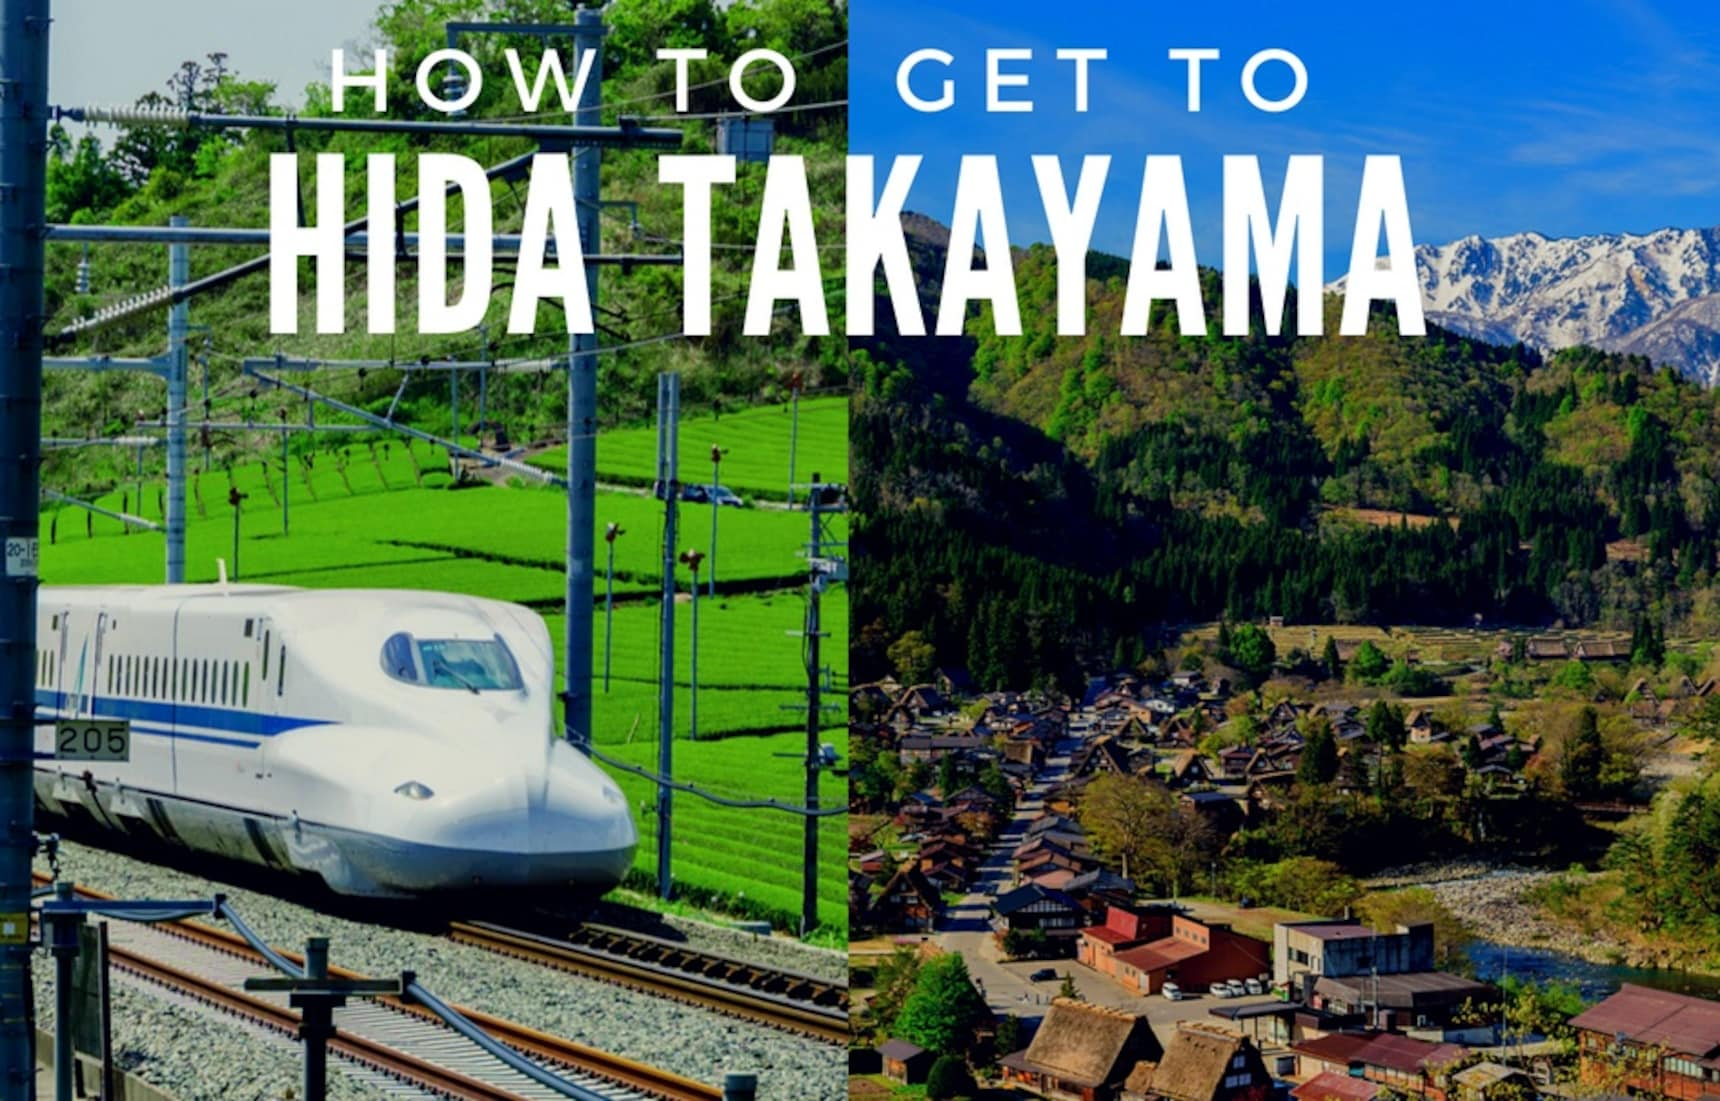 How to Get to Hida Takayama